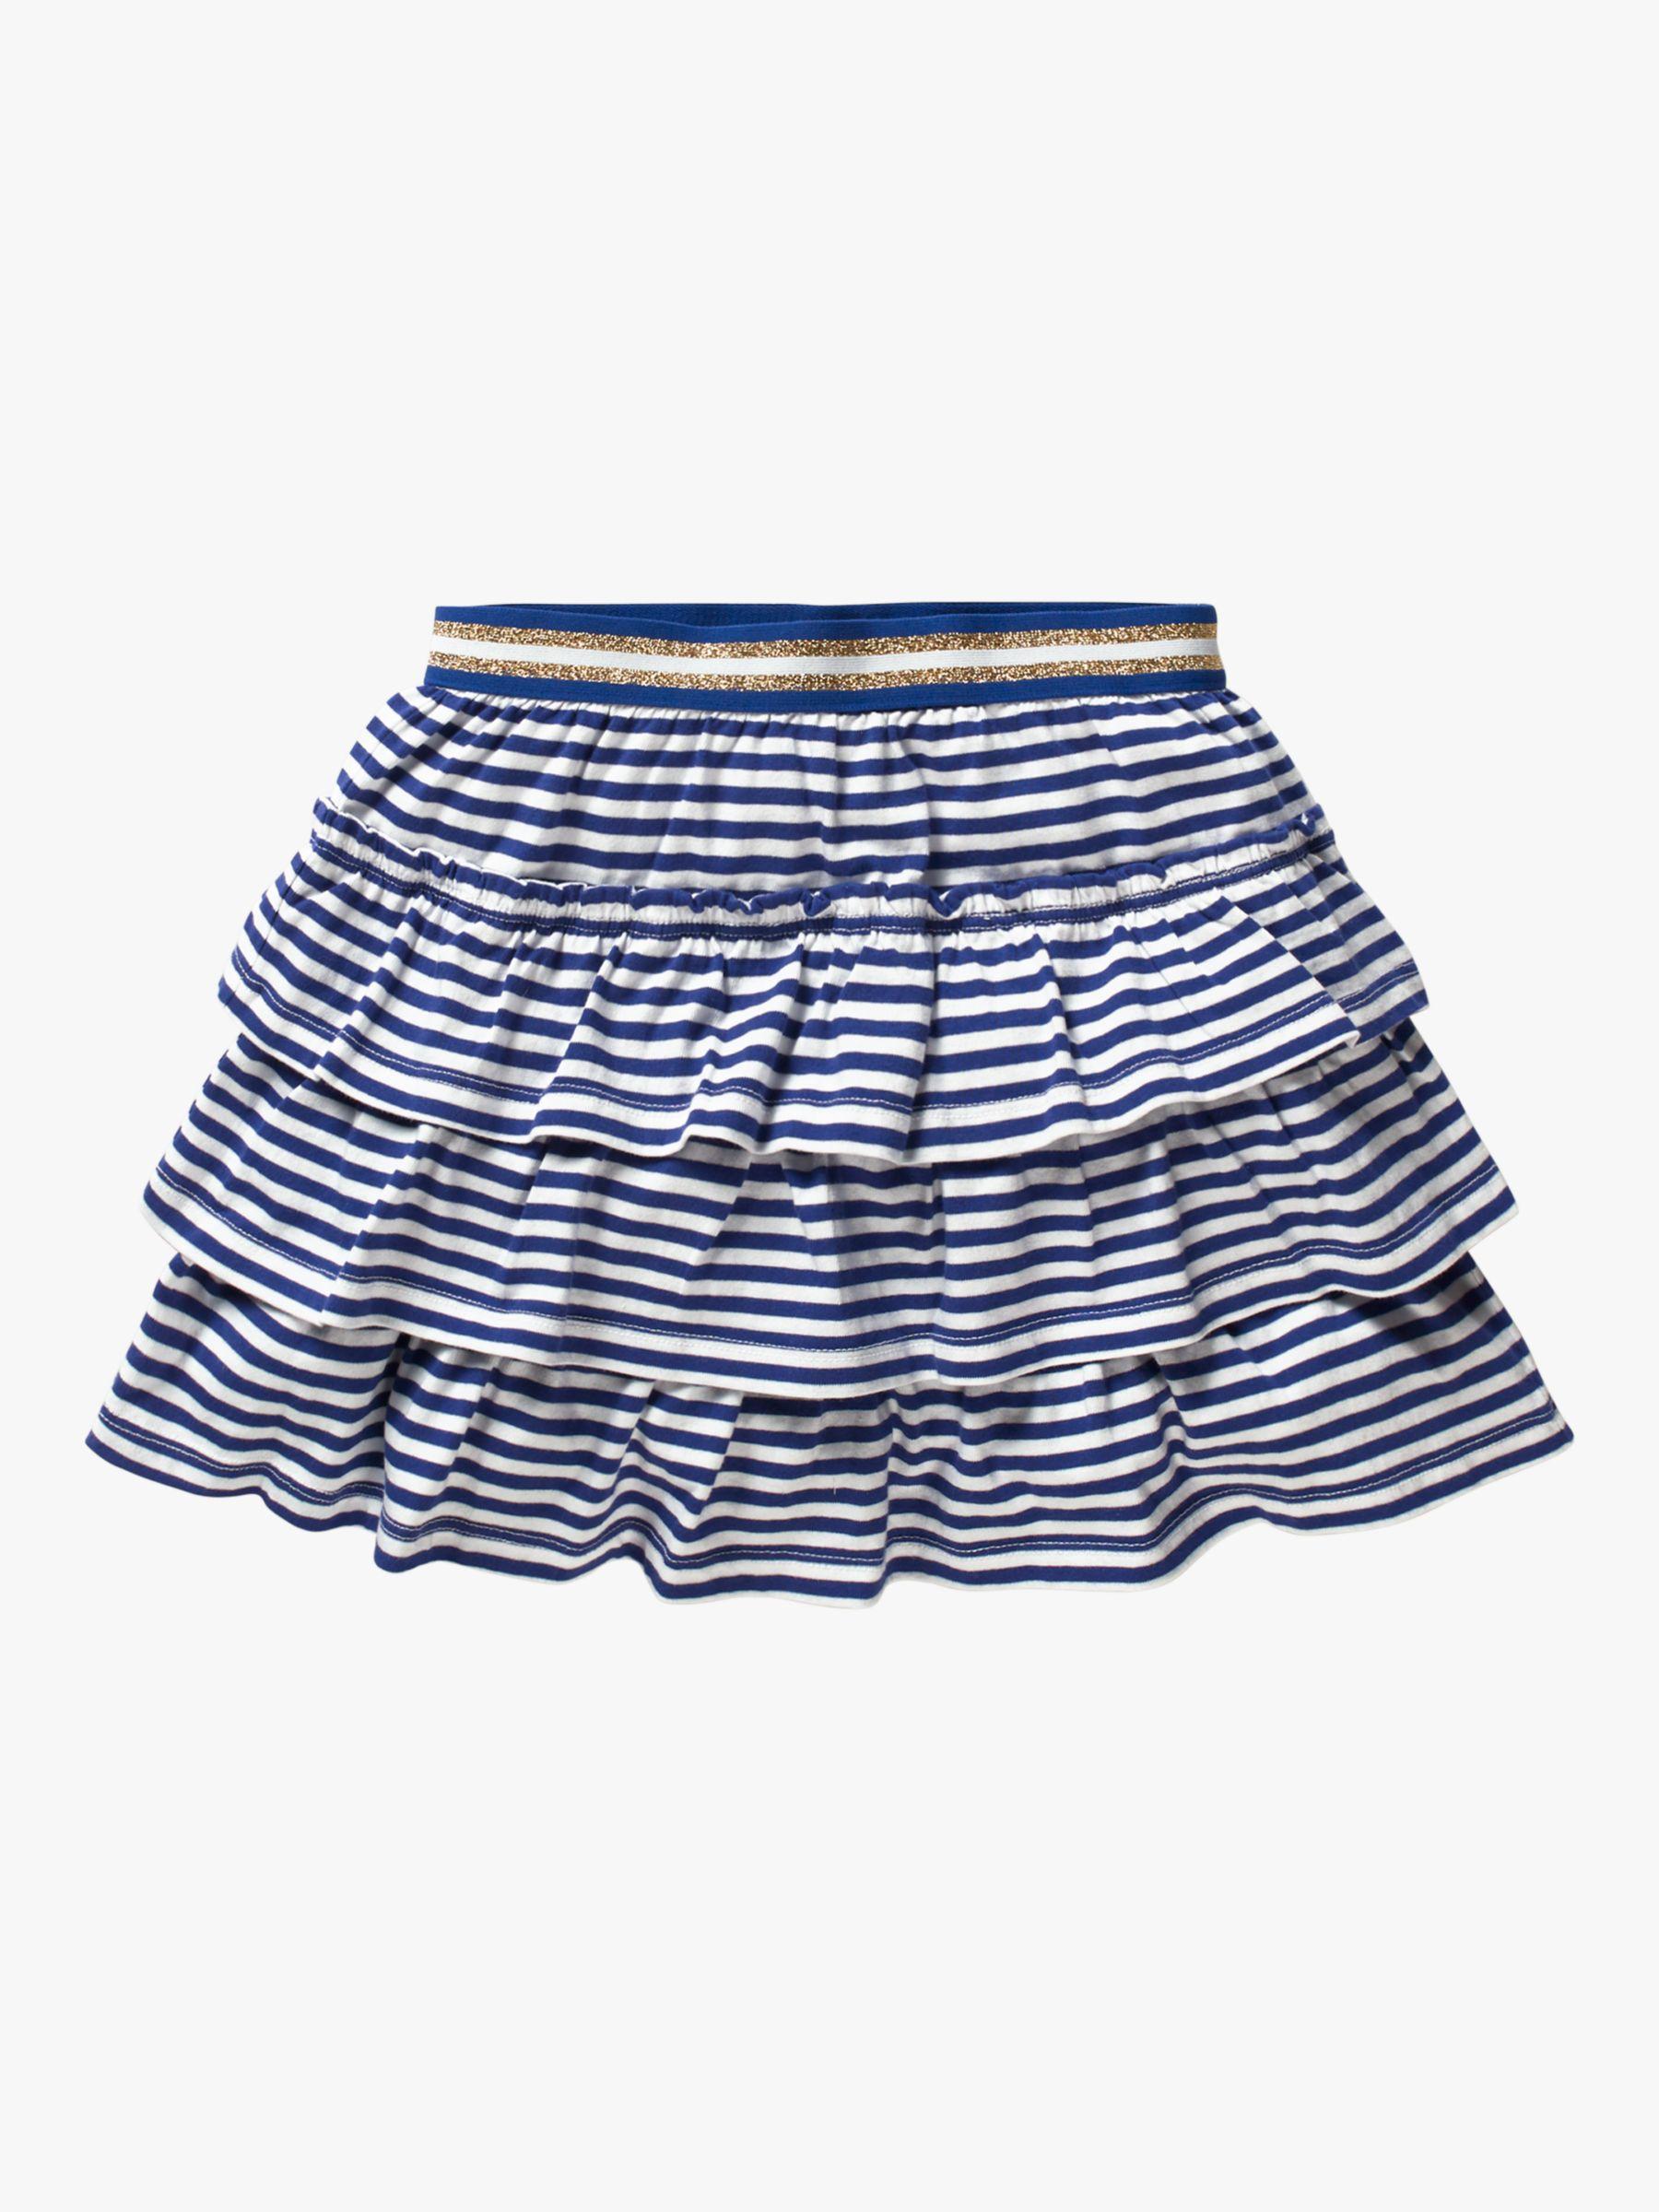 Mini Boden Mini Boden Girls' Jersey Stripe Ruffle Skort, Indigo Navy/White